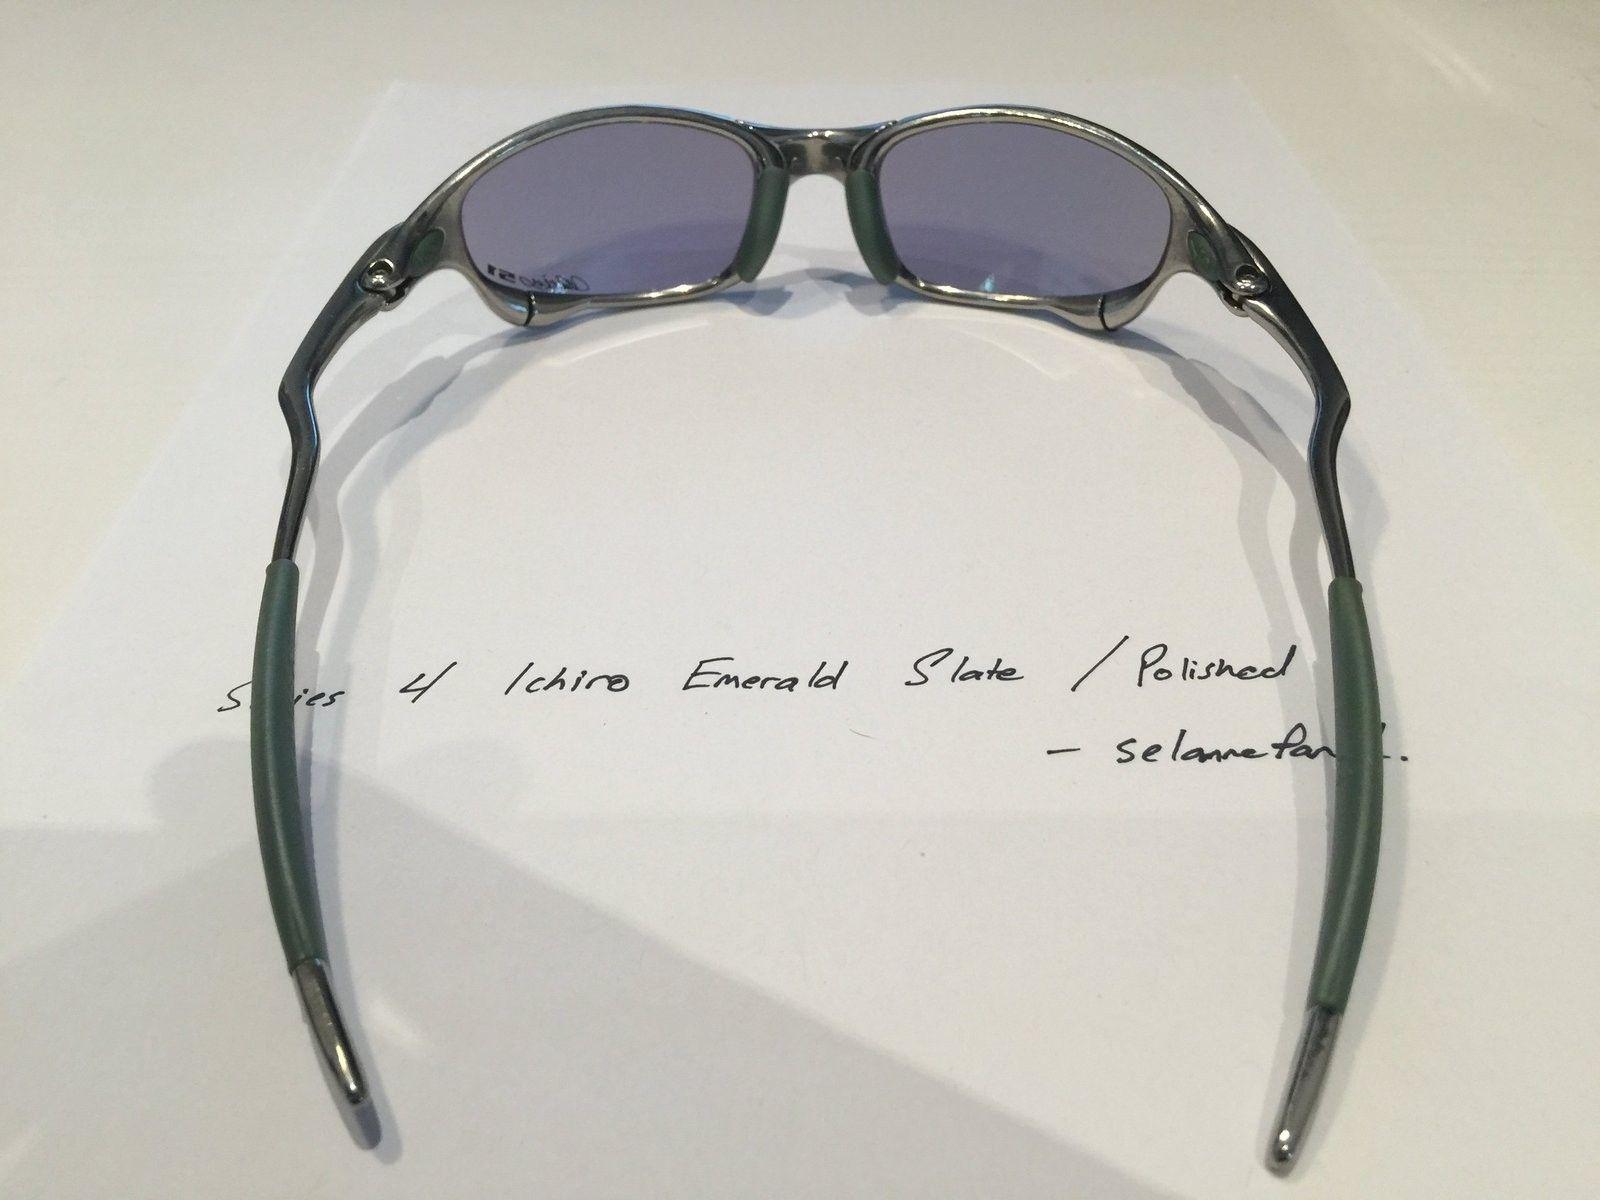 Ichiro Emerald Slate / Polished Frame Juliets (with box) - IMG_3819.JPG